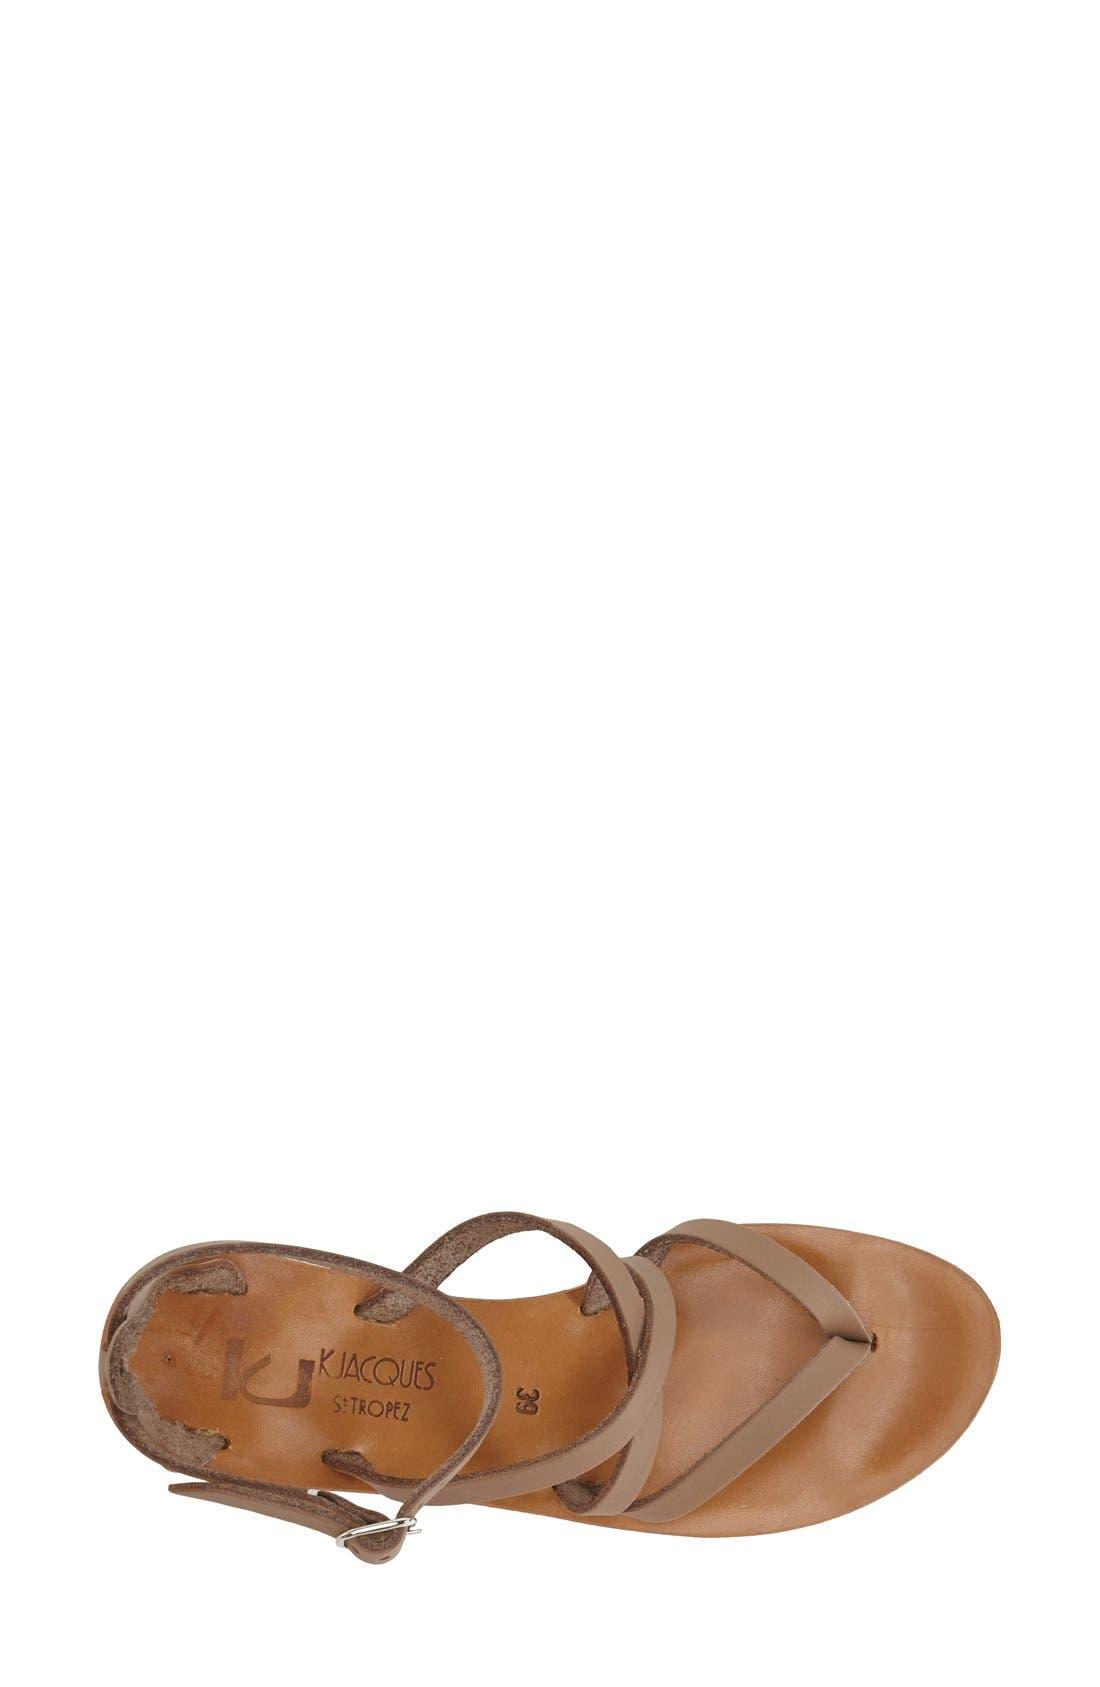 Alternate Image 3  - K.Jacques St. Tropez 'Cunegonde' Wedge Sandal (Women)